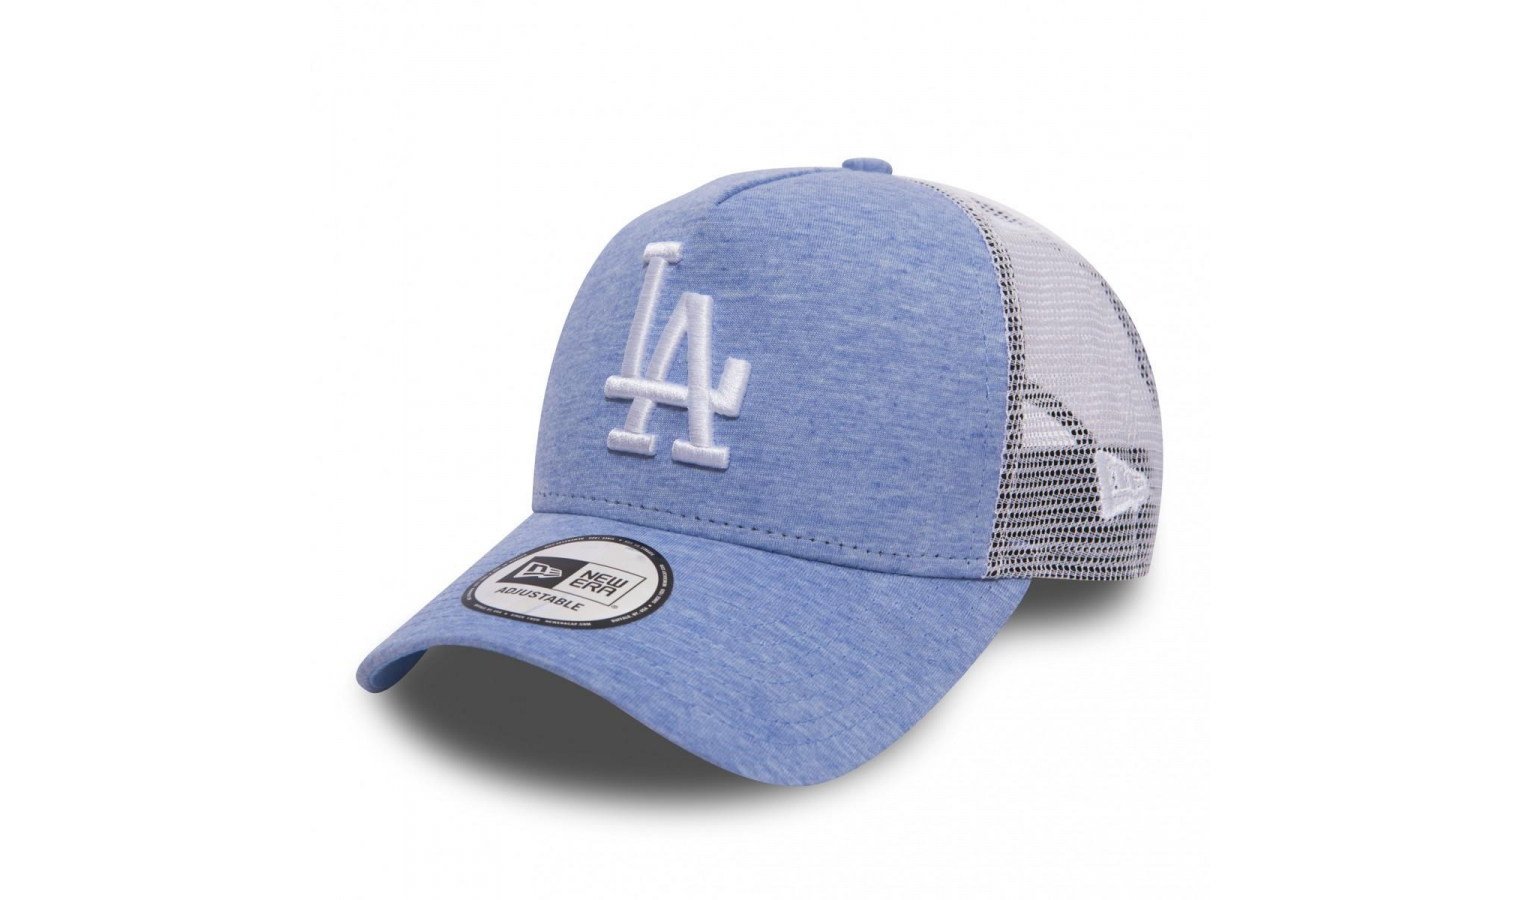 6f005be15 Dámska šiltovka New Era 9FORTY Afra JERSEY ESSENTIAL TRUCKER LA Dodgers W  biela